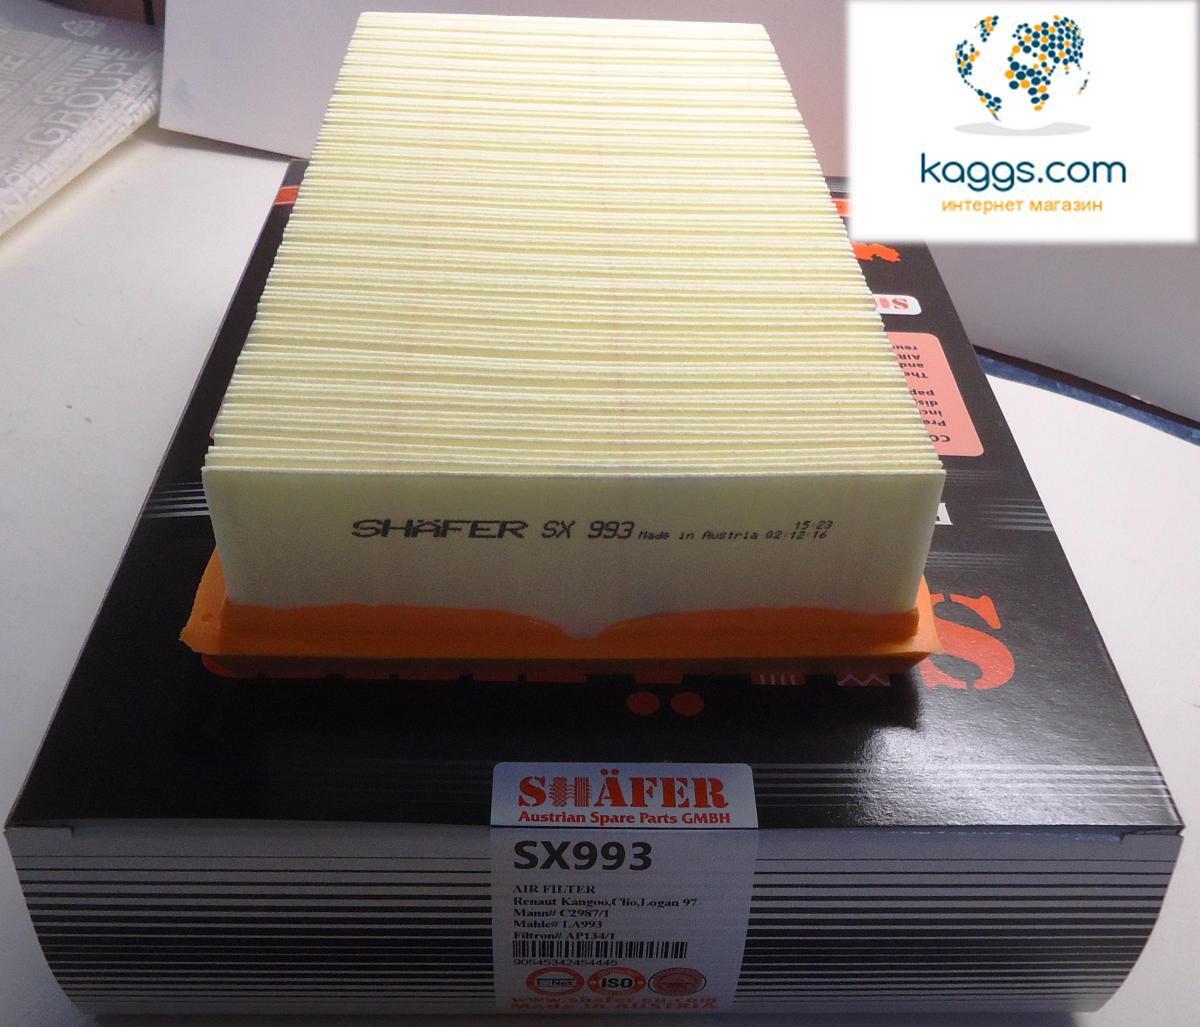 SHÄFER SX993 воздушный фильтр для SUZUKI, DACIA, RENAULT.